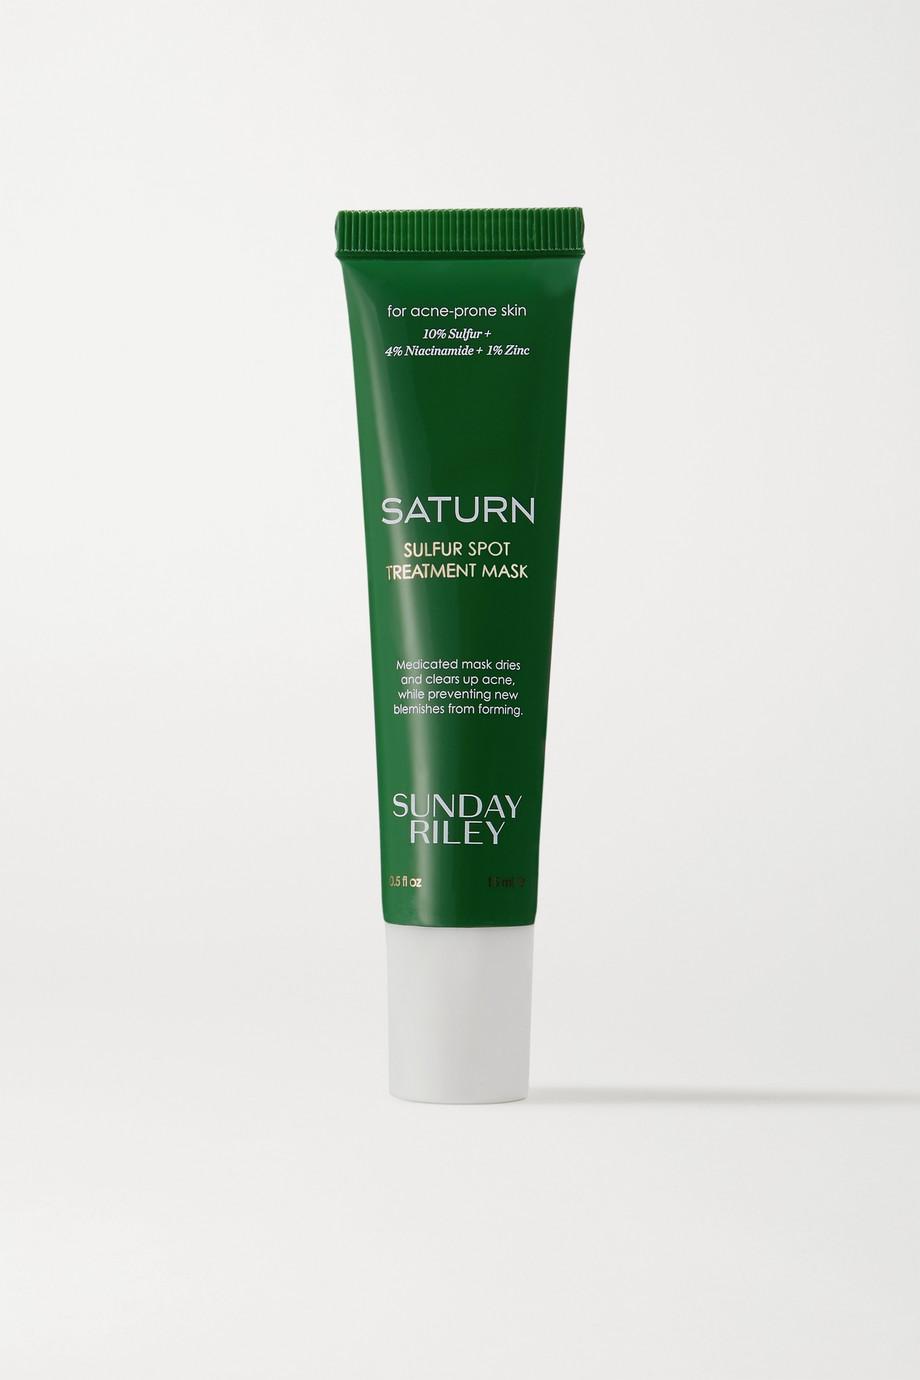 Sunday Riley Saturn Sulfur Spot Treatment Mask, 15ml